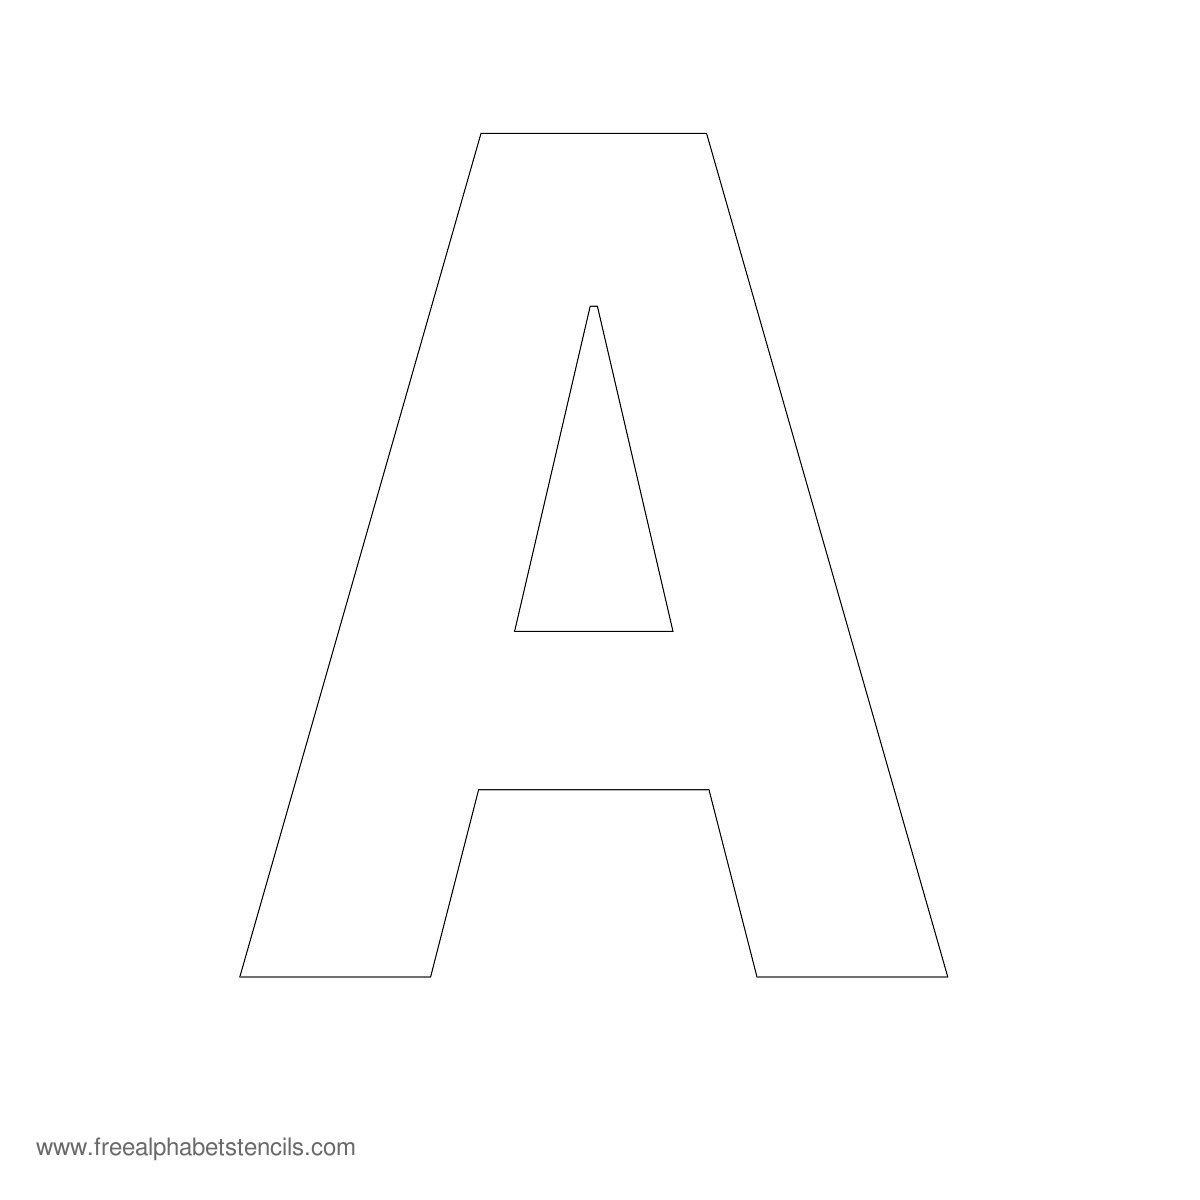 Large Alphabet Stencils | Freealphabetstencils - Free Printable Alphabet Stencils Templates